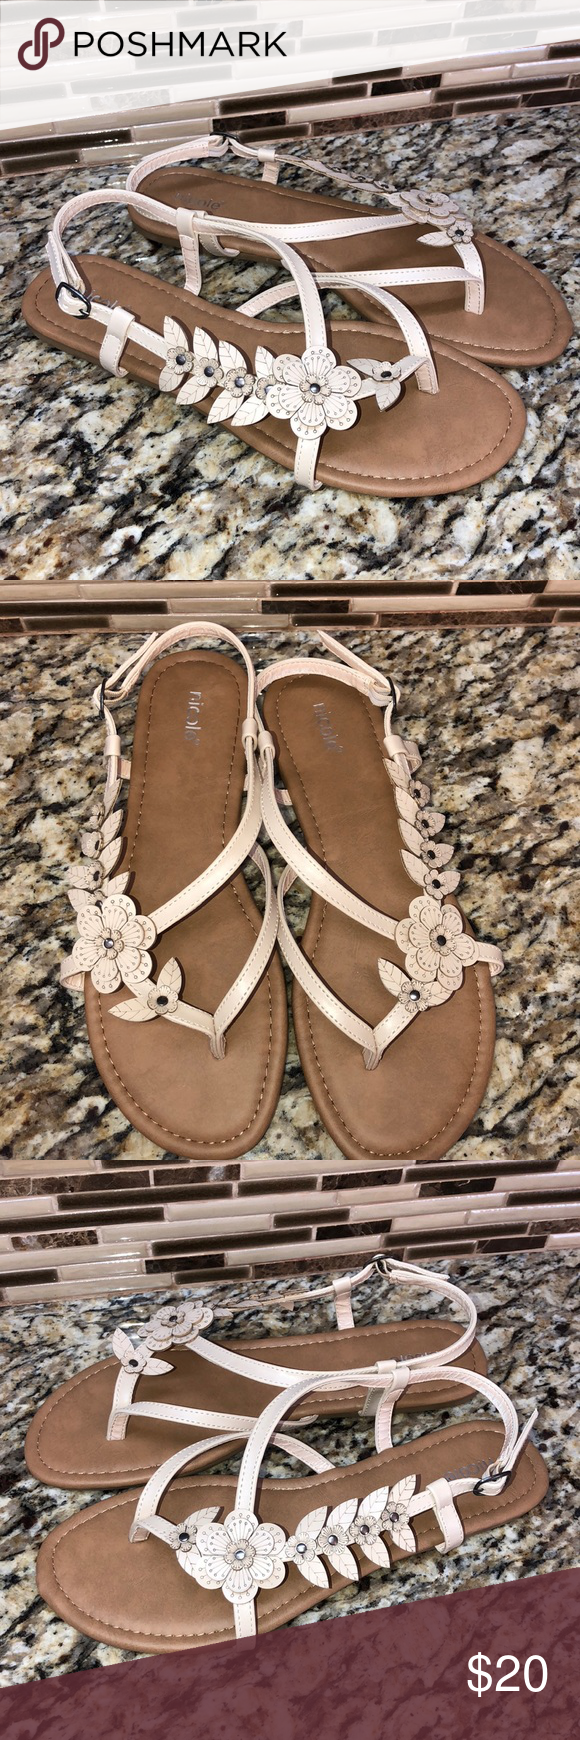 Nicole wide woman sandal brand new size